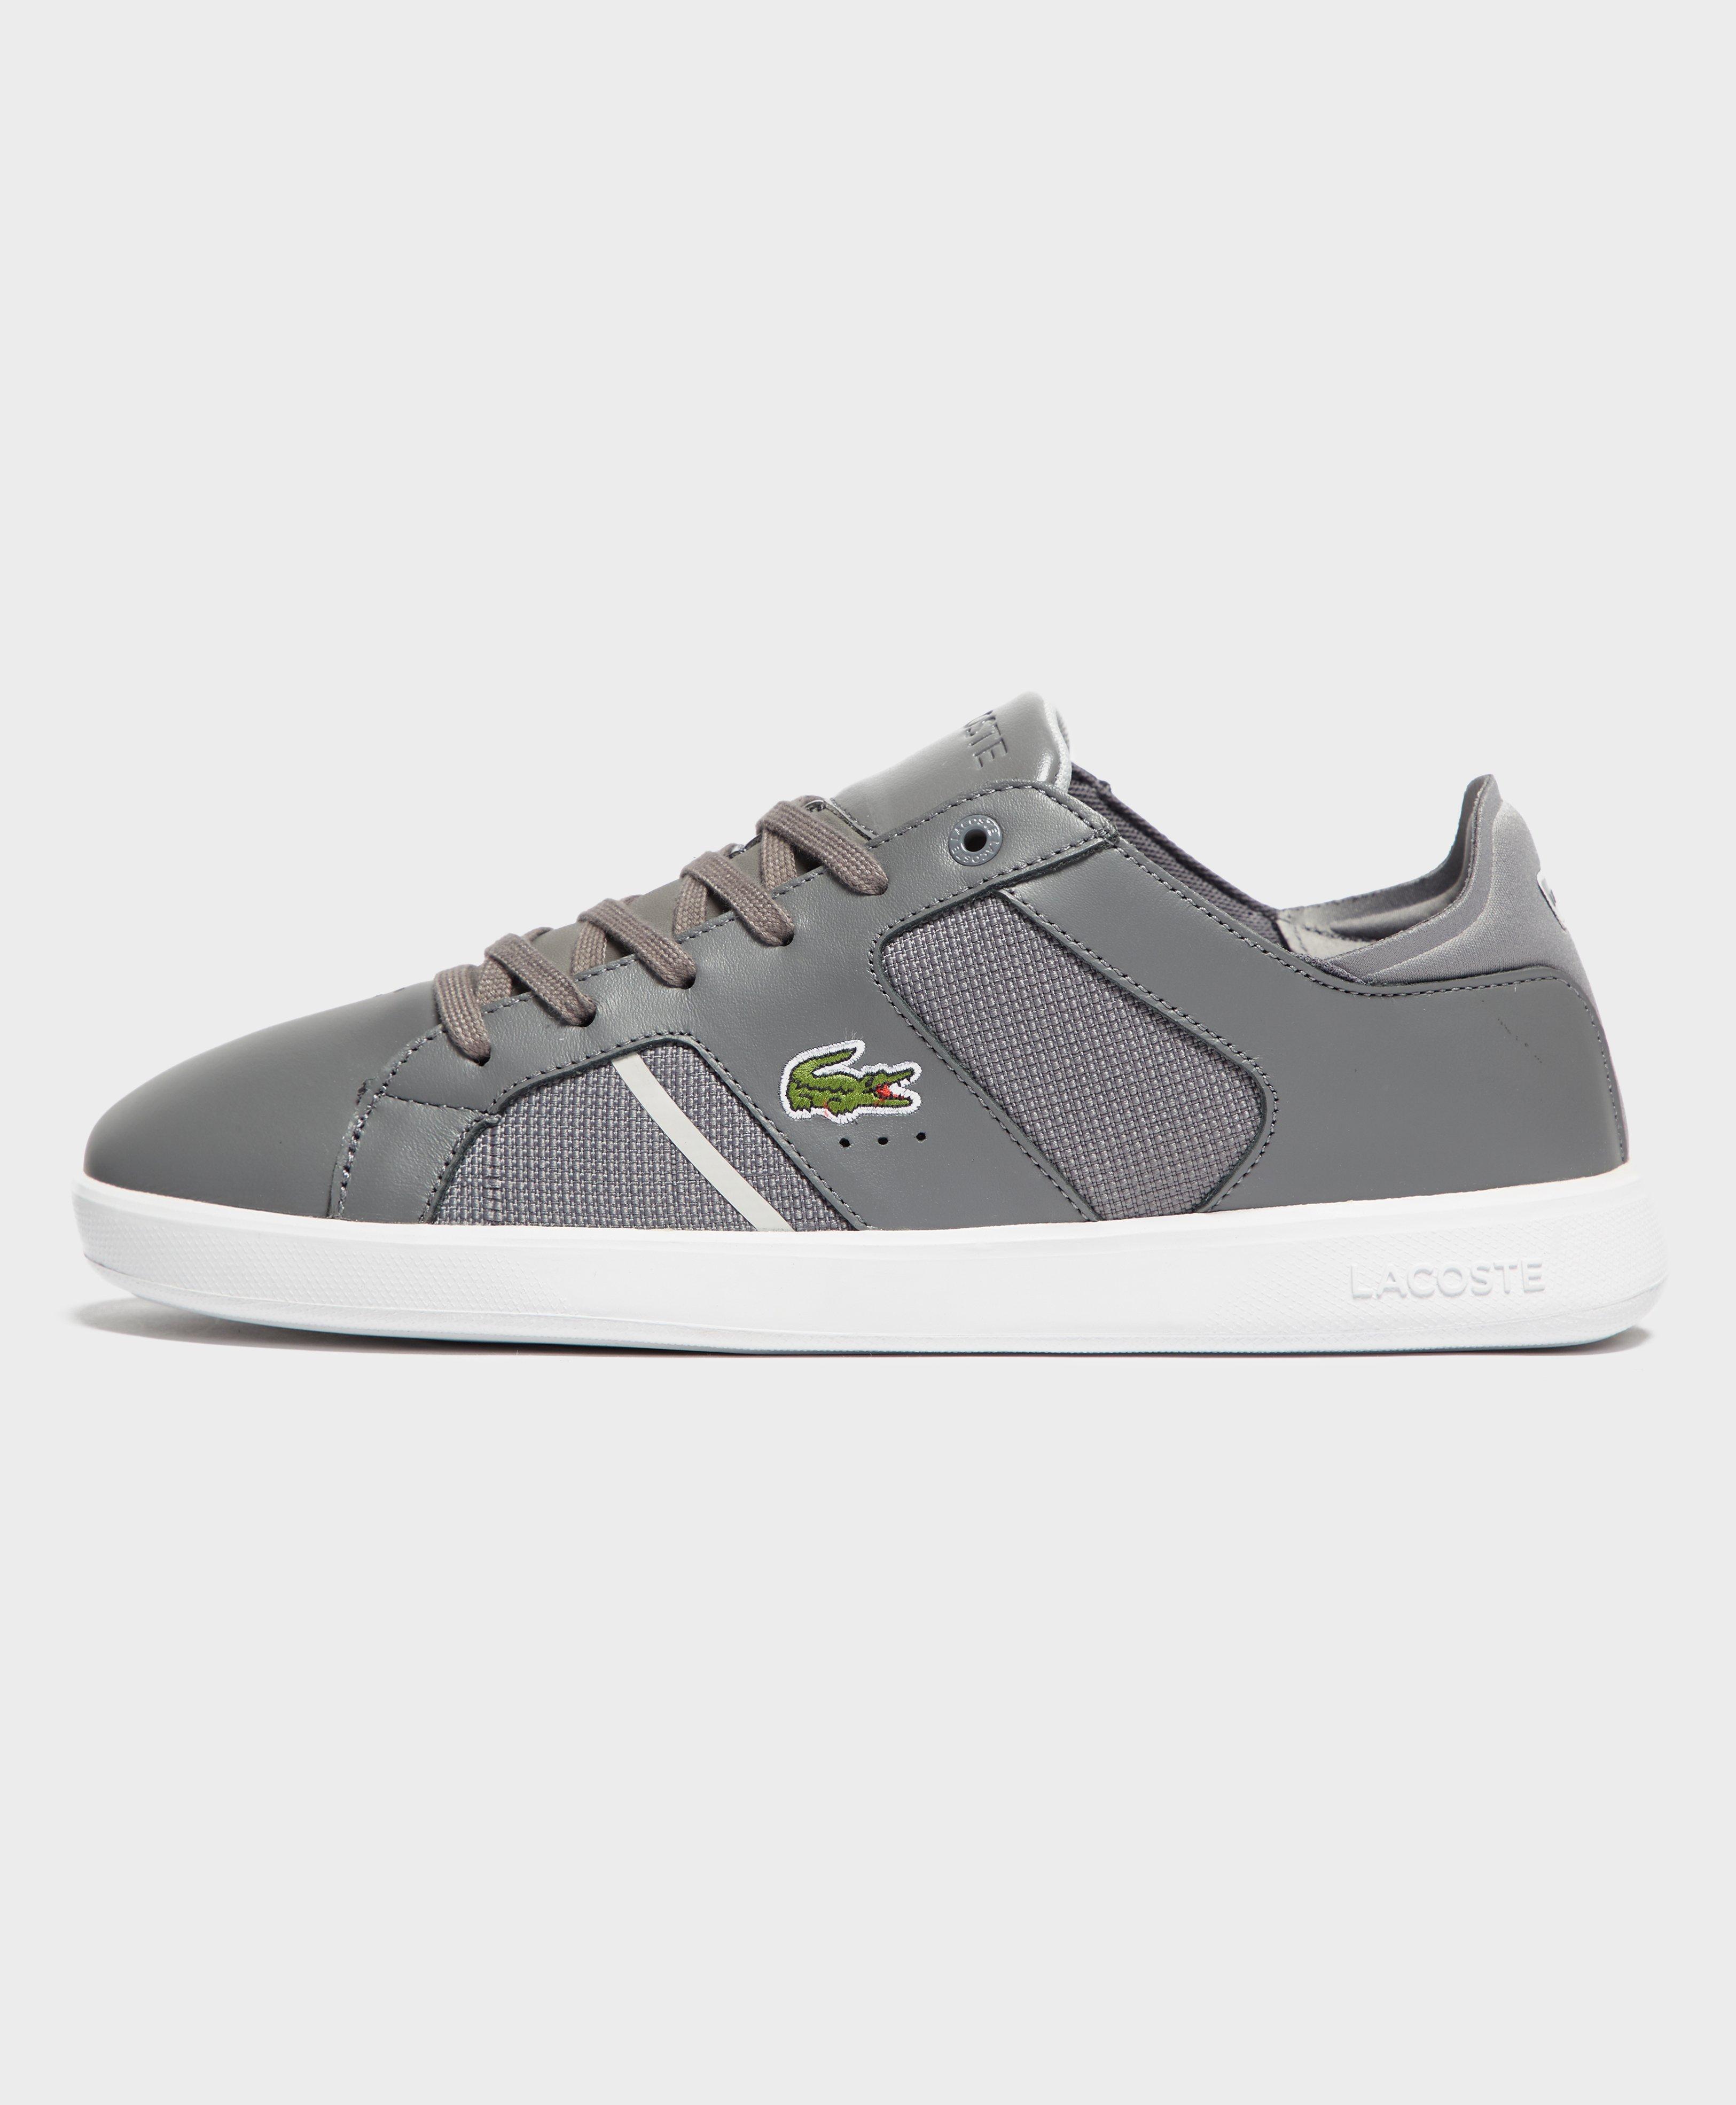 437d12dad2081 Lacoste Novas 318 in Gray for Men - Lyst